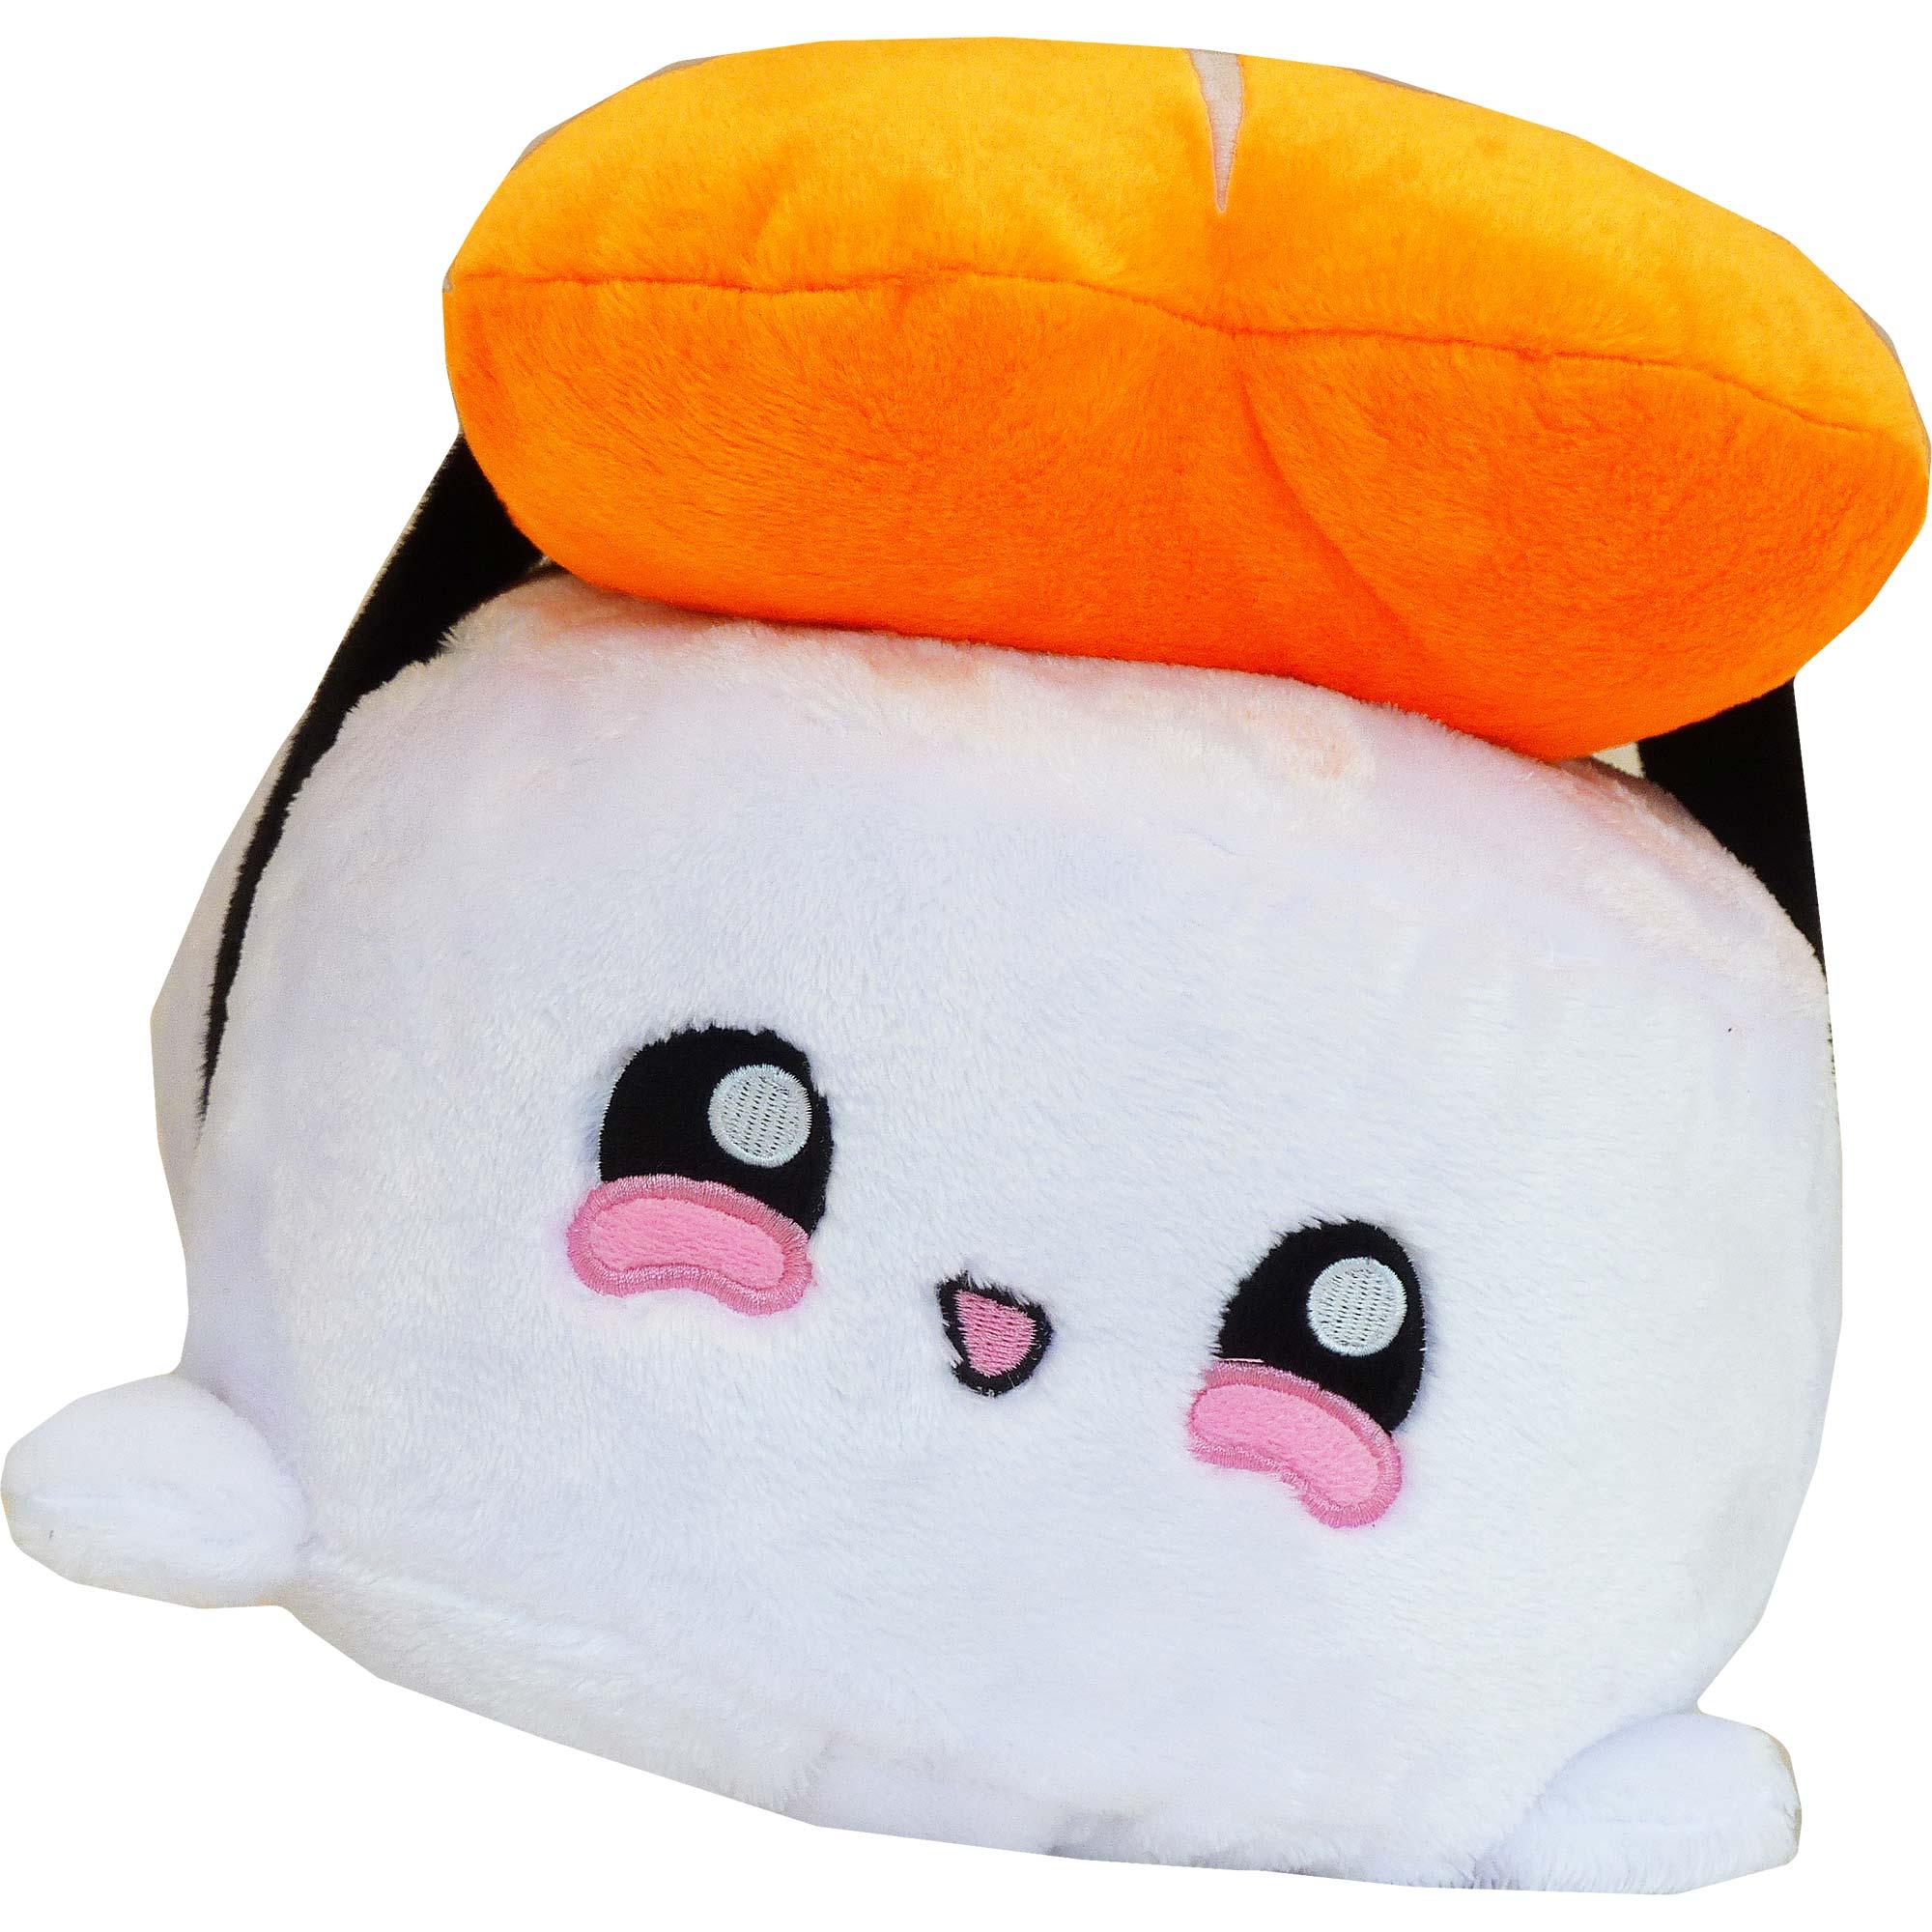 Moodrush Shrimp Sushi Pillow Smiley Emoticon Plush Shop